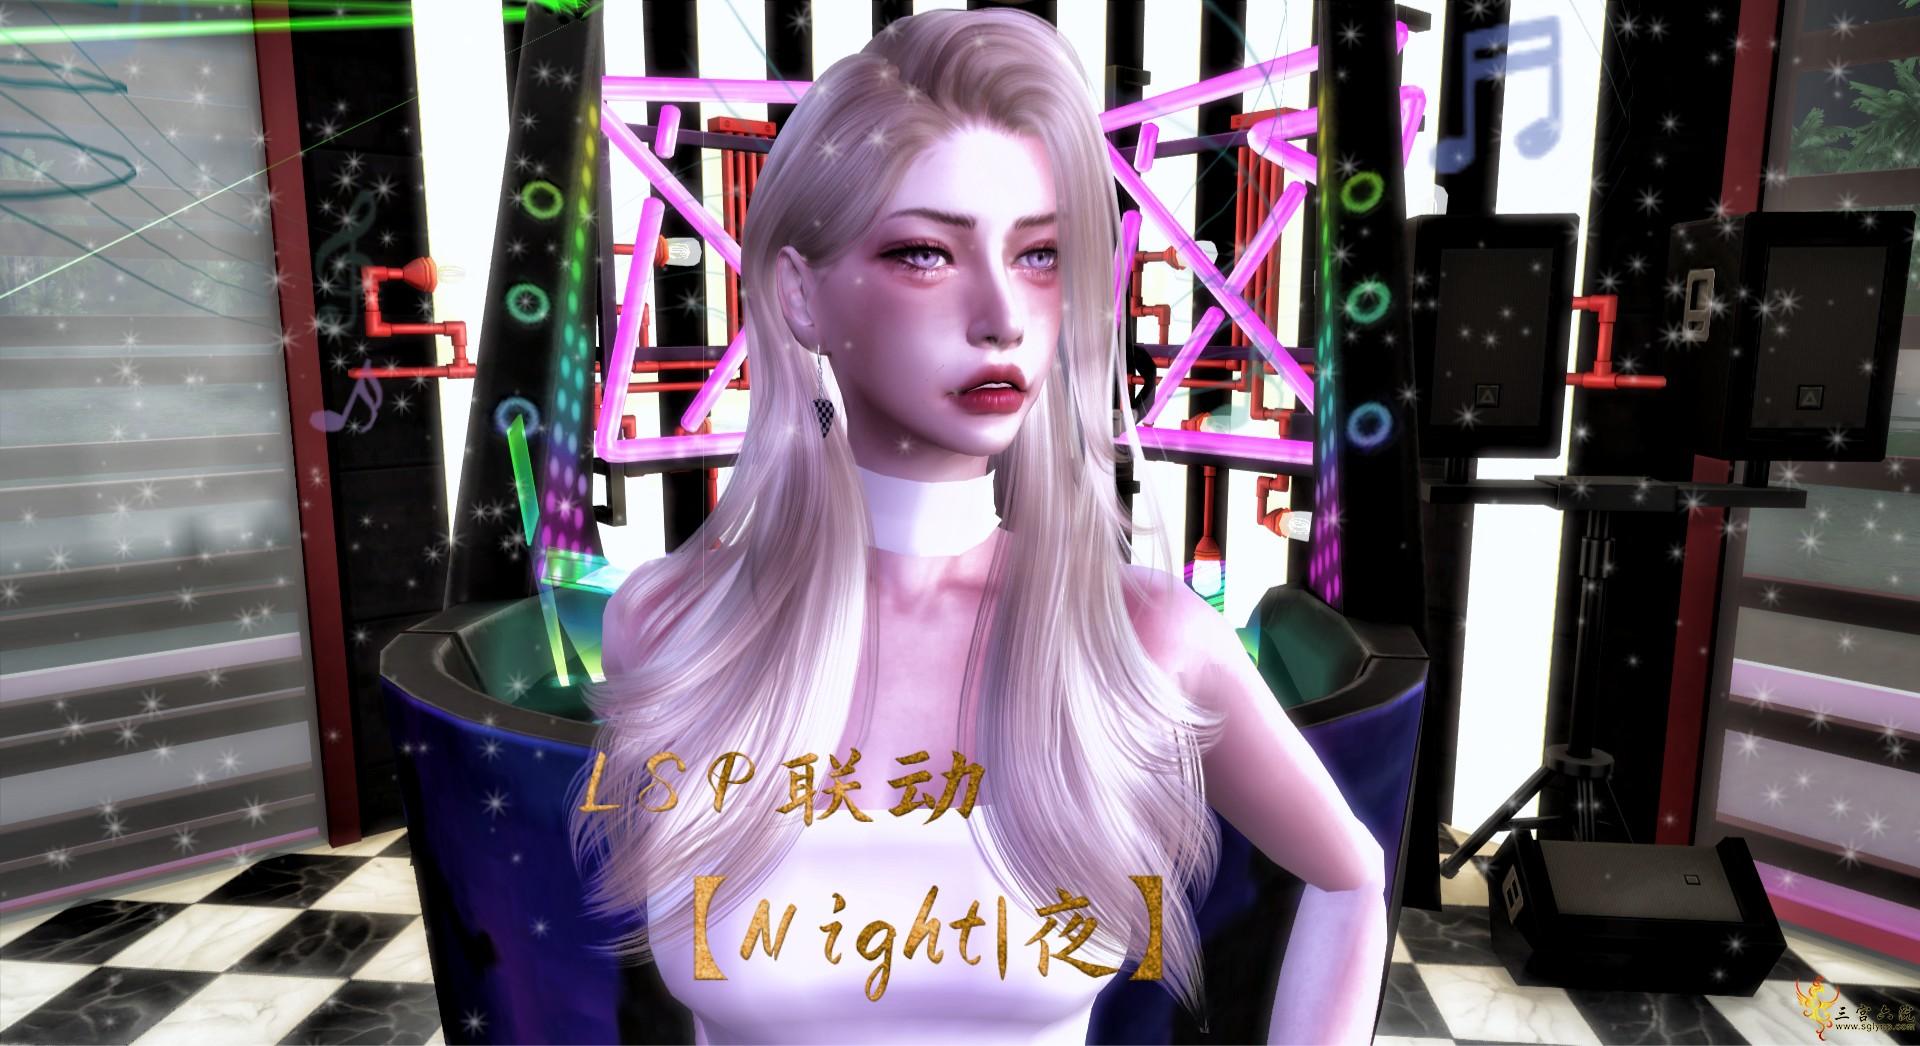 LSP联动 【Night|夜】玛姬.贝丝.png